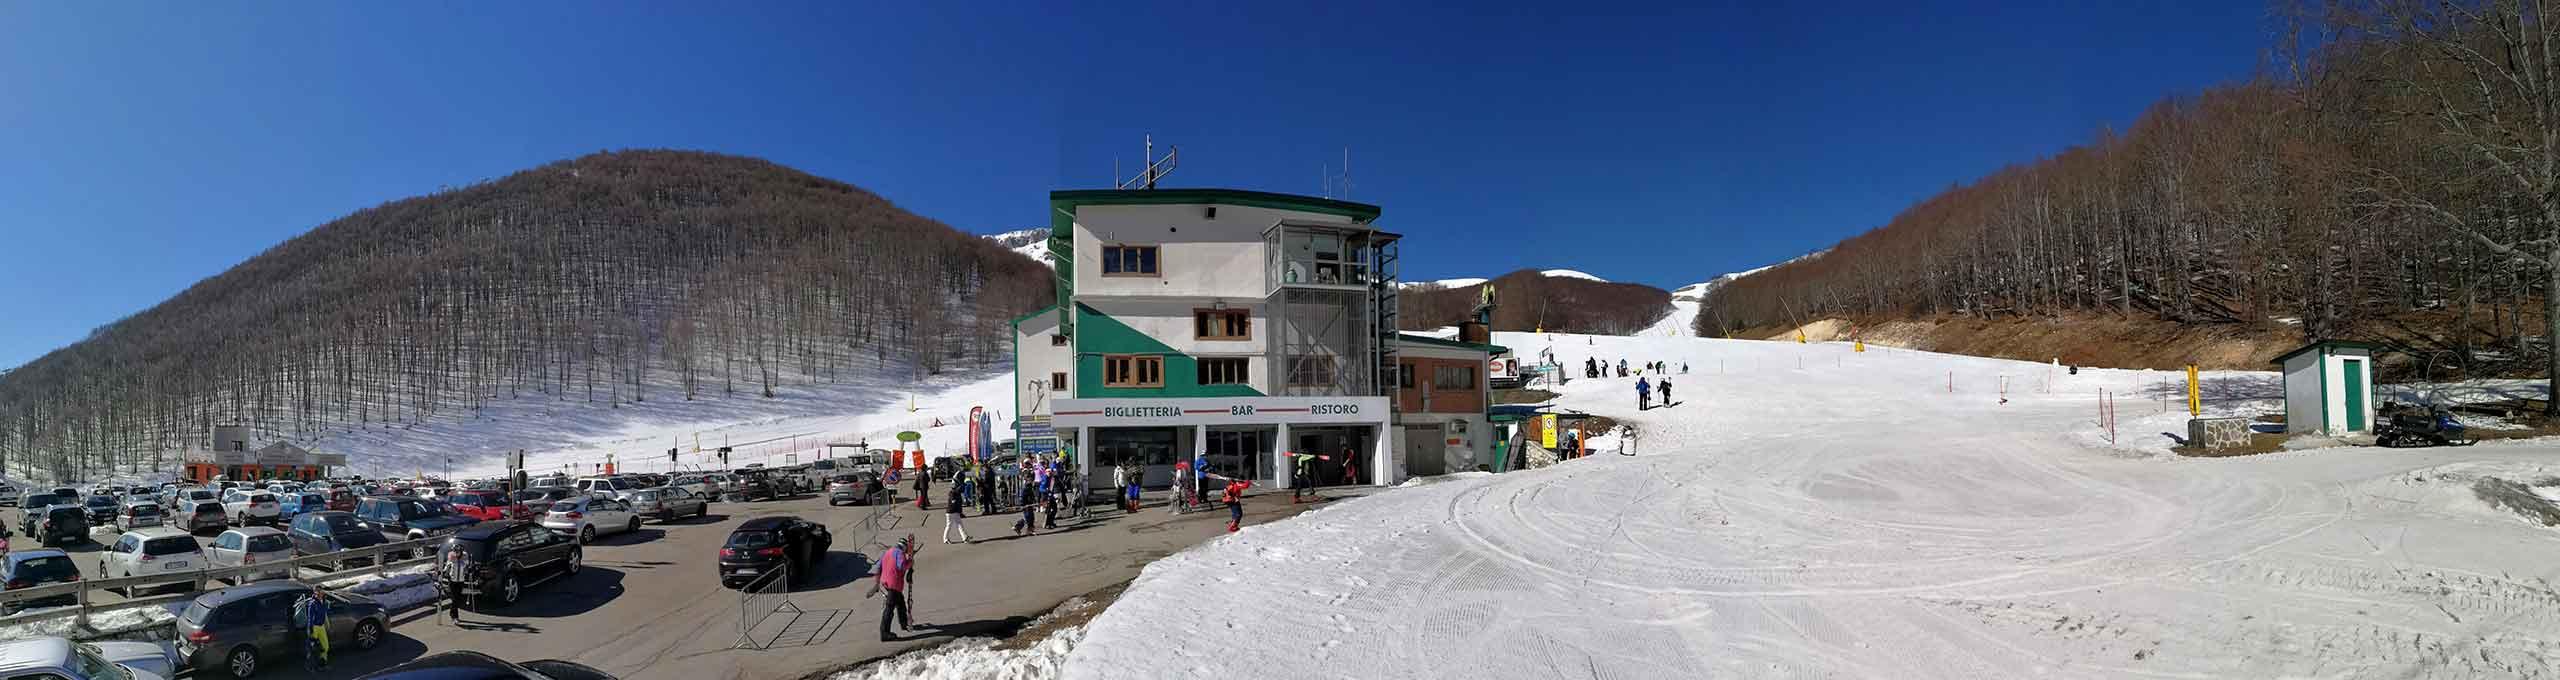 Macchione ski resort